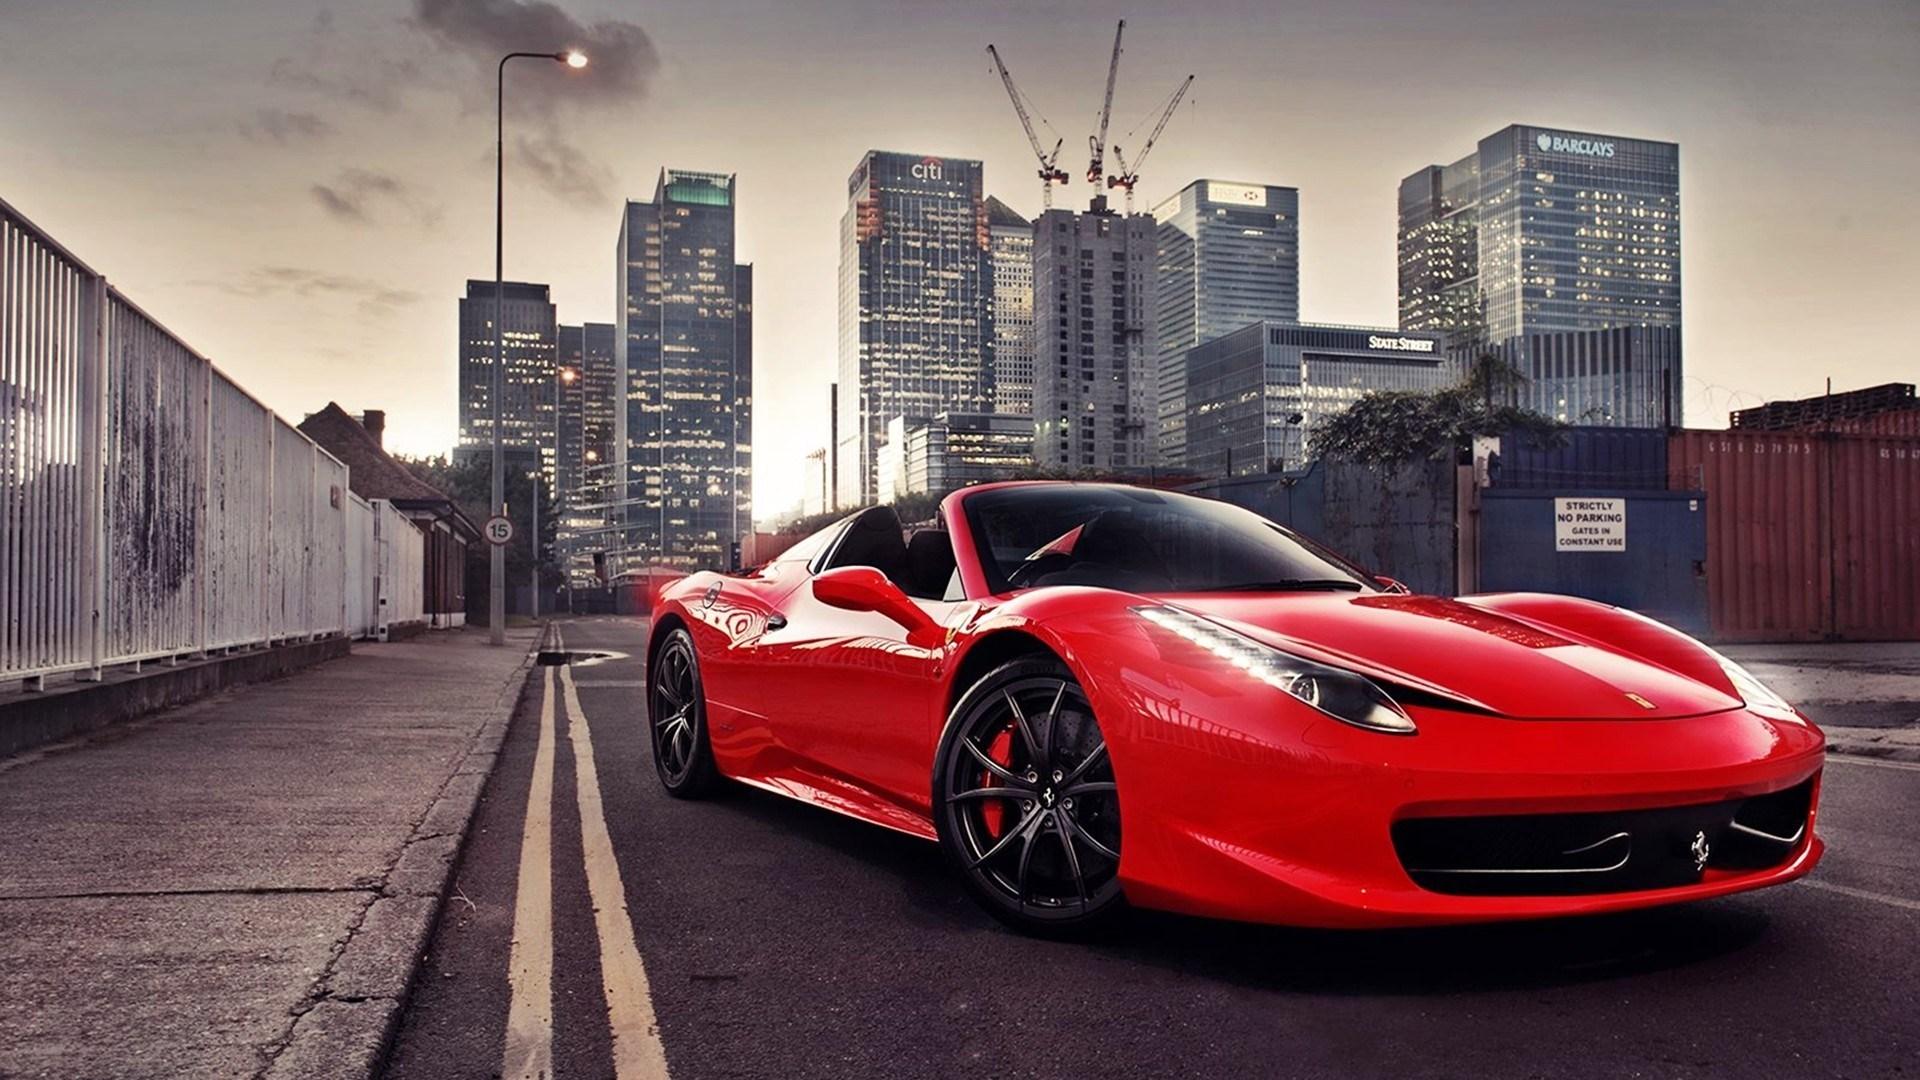 Red Ferrari 458 Italia Street City Photo